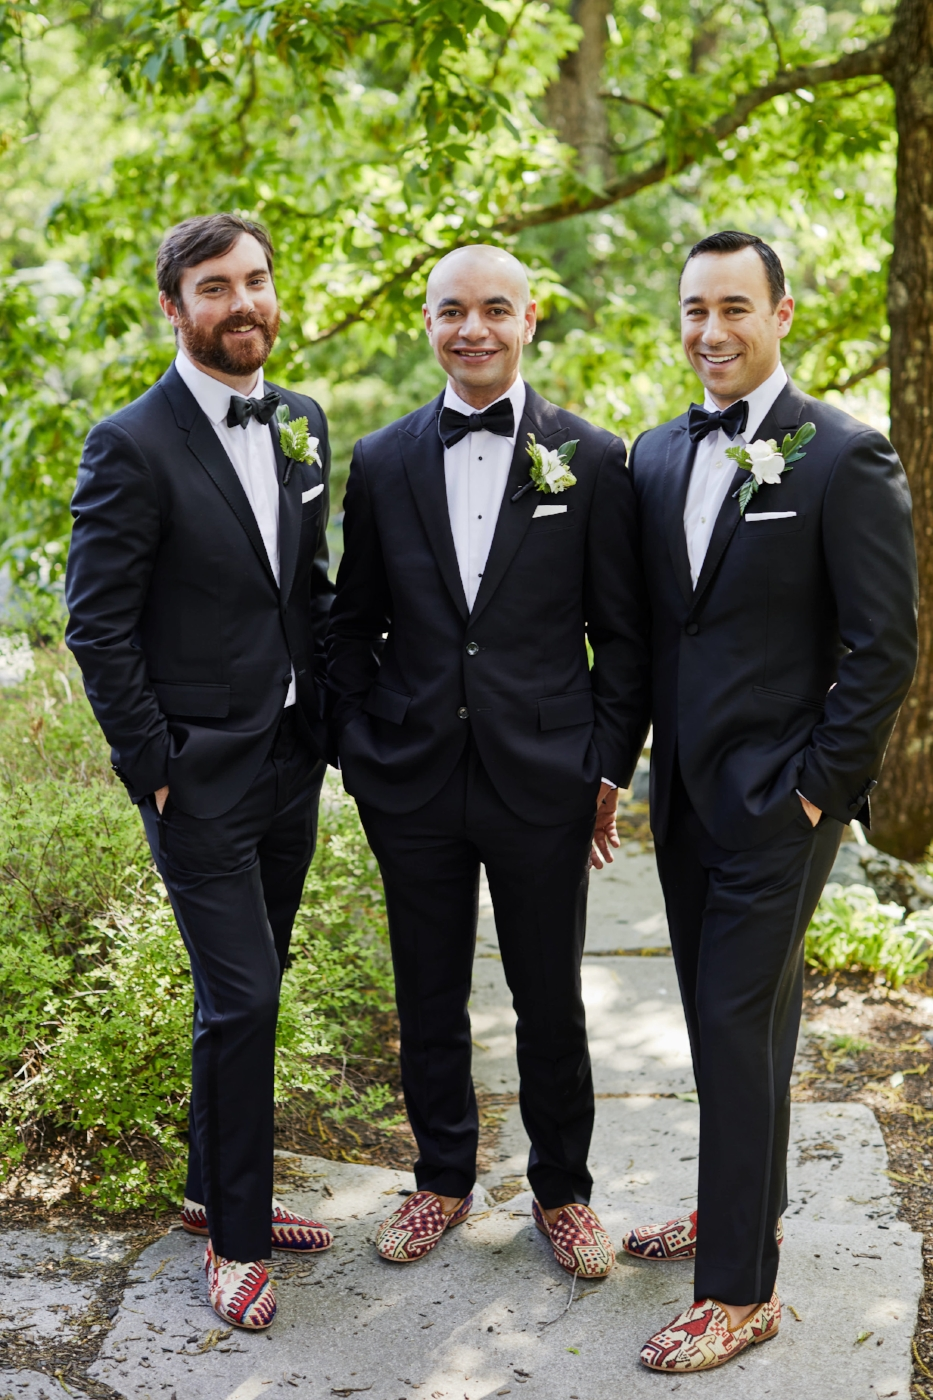 Charlie, Jon & Zach